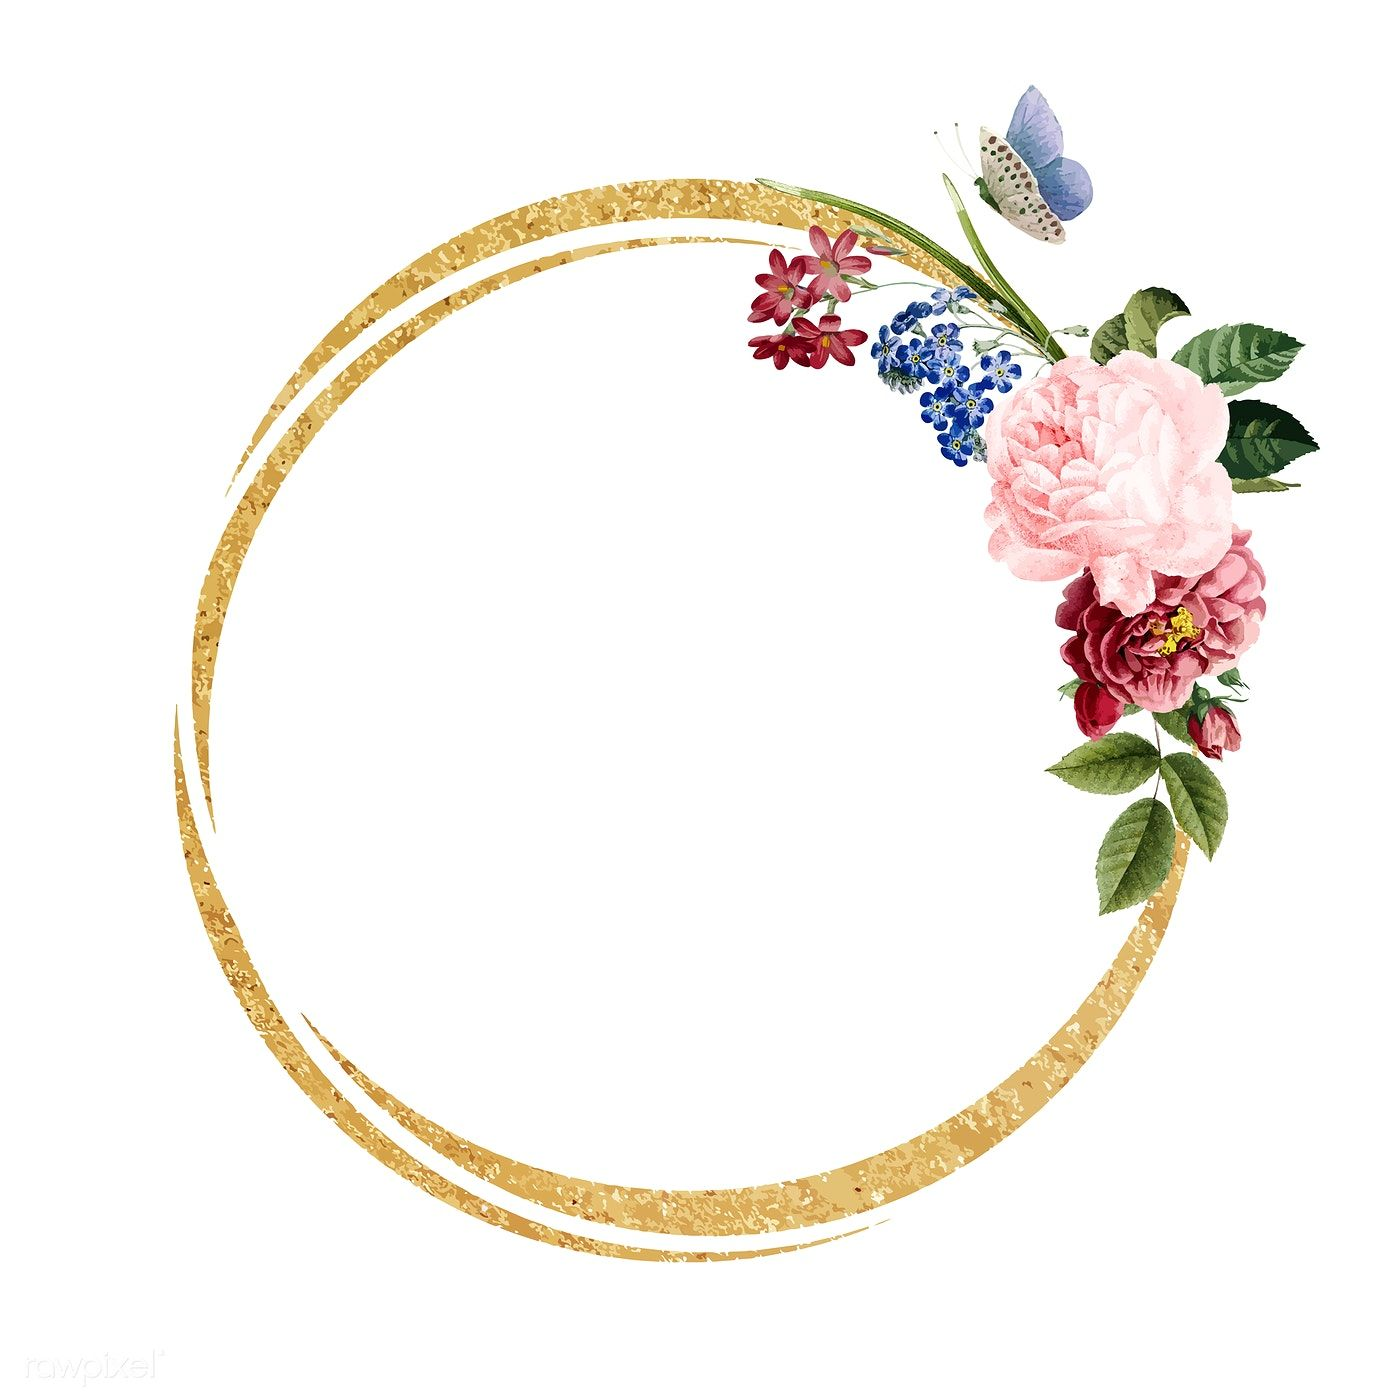 Blank Floral Frame Card Illustration Free Image By Rawpixel Com Monograma Casamento Molduras Para Convites De Casamento Convite De Casamento